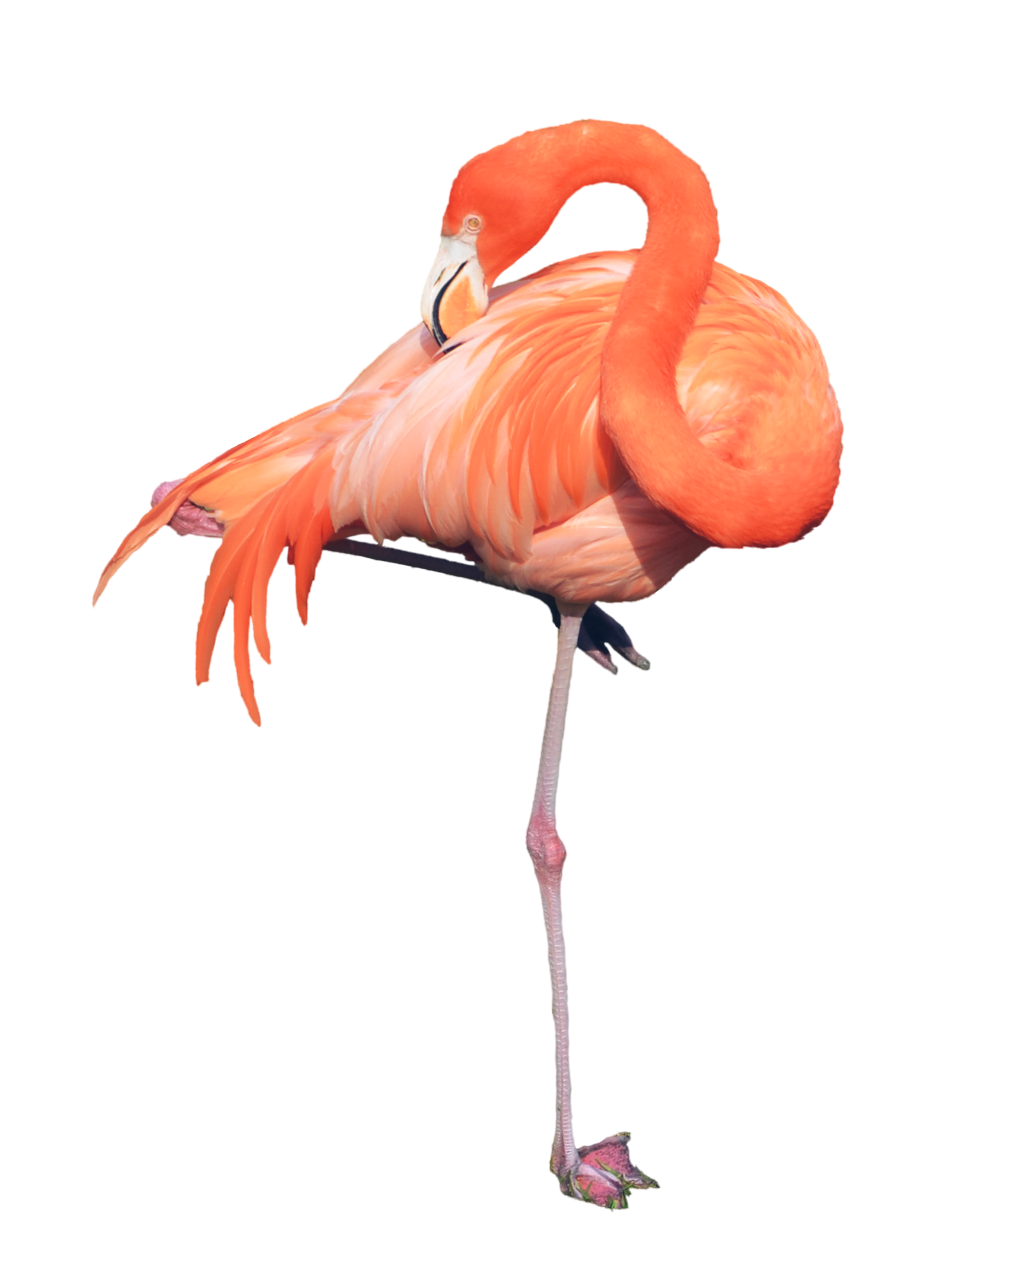 #ftestickers #flamingo #FreeToEdit